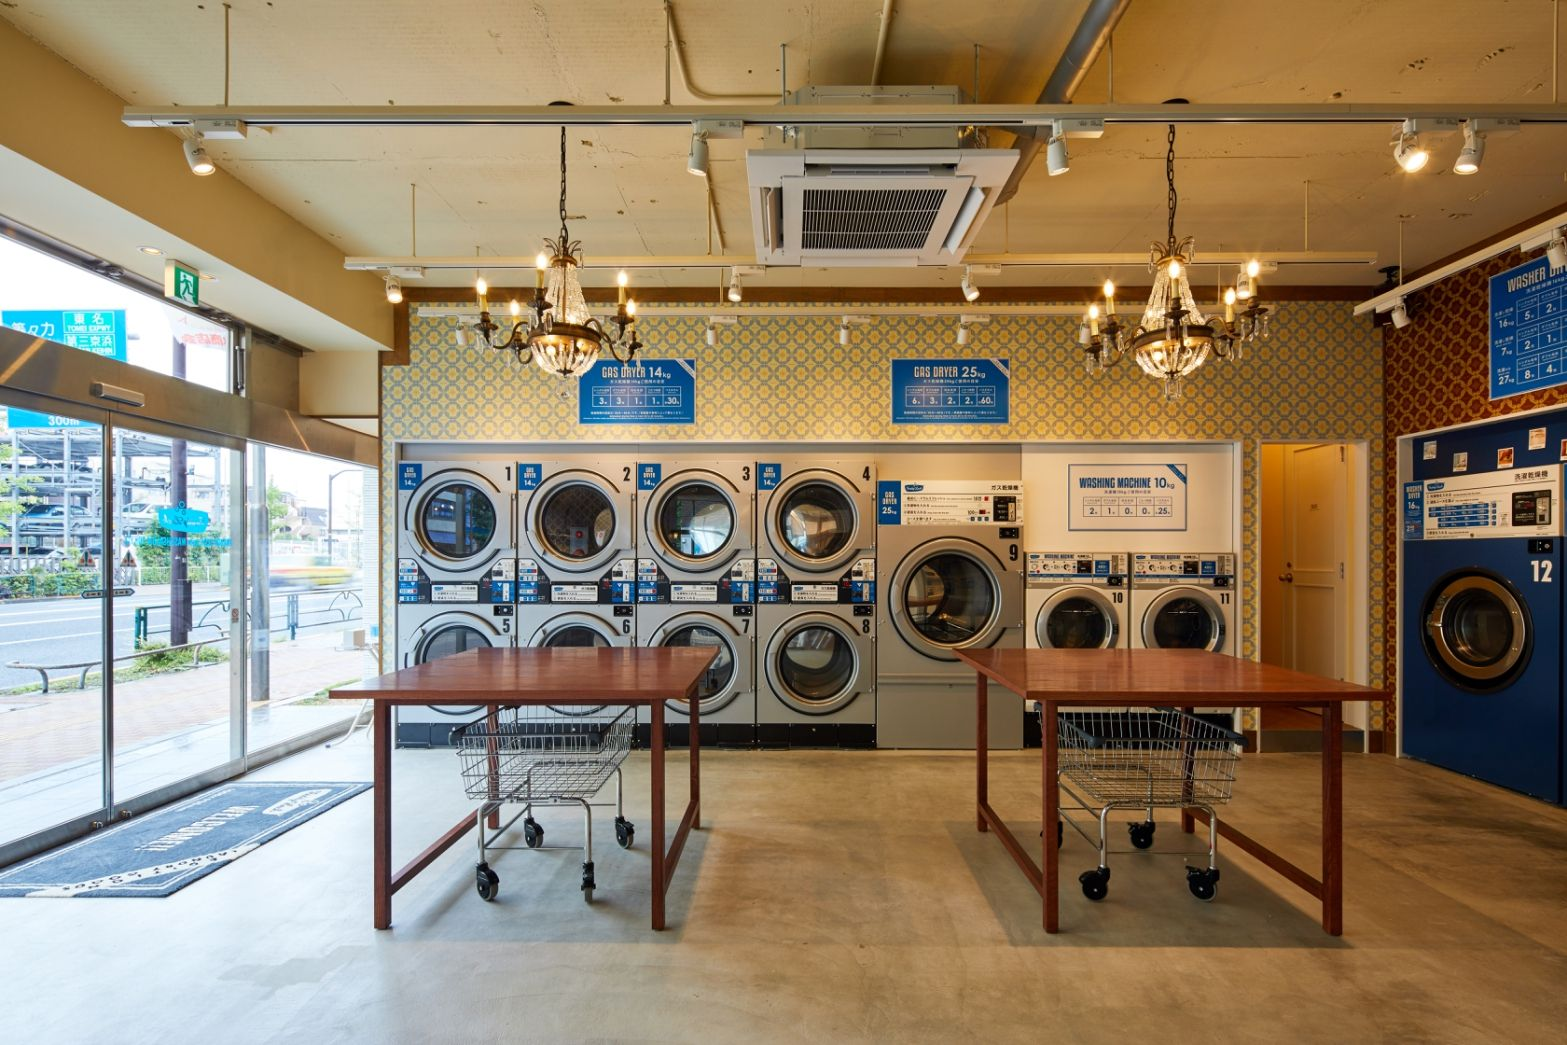 Imagen Relacionada Laundry Shop Laundry Business Laundry Design